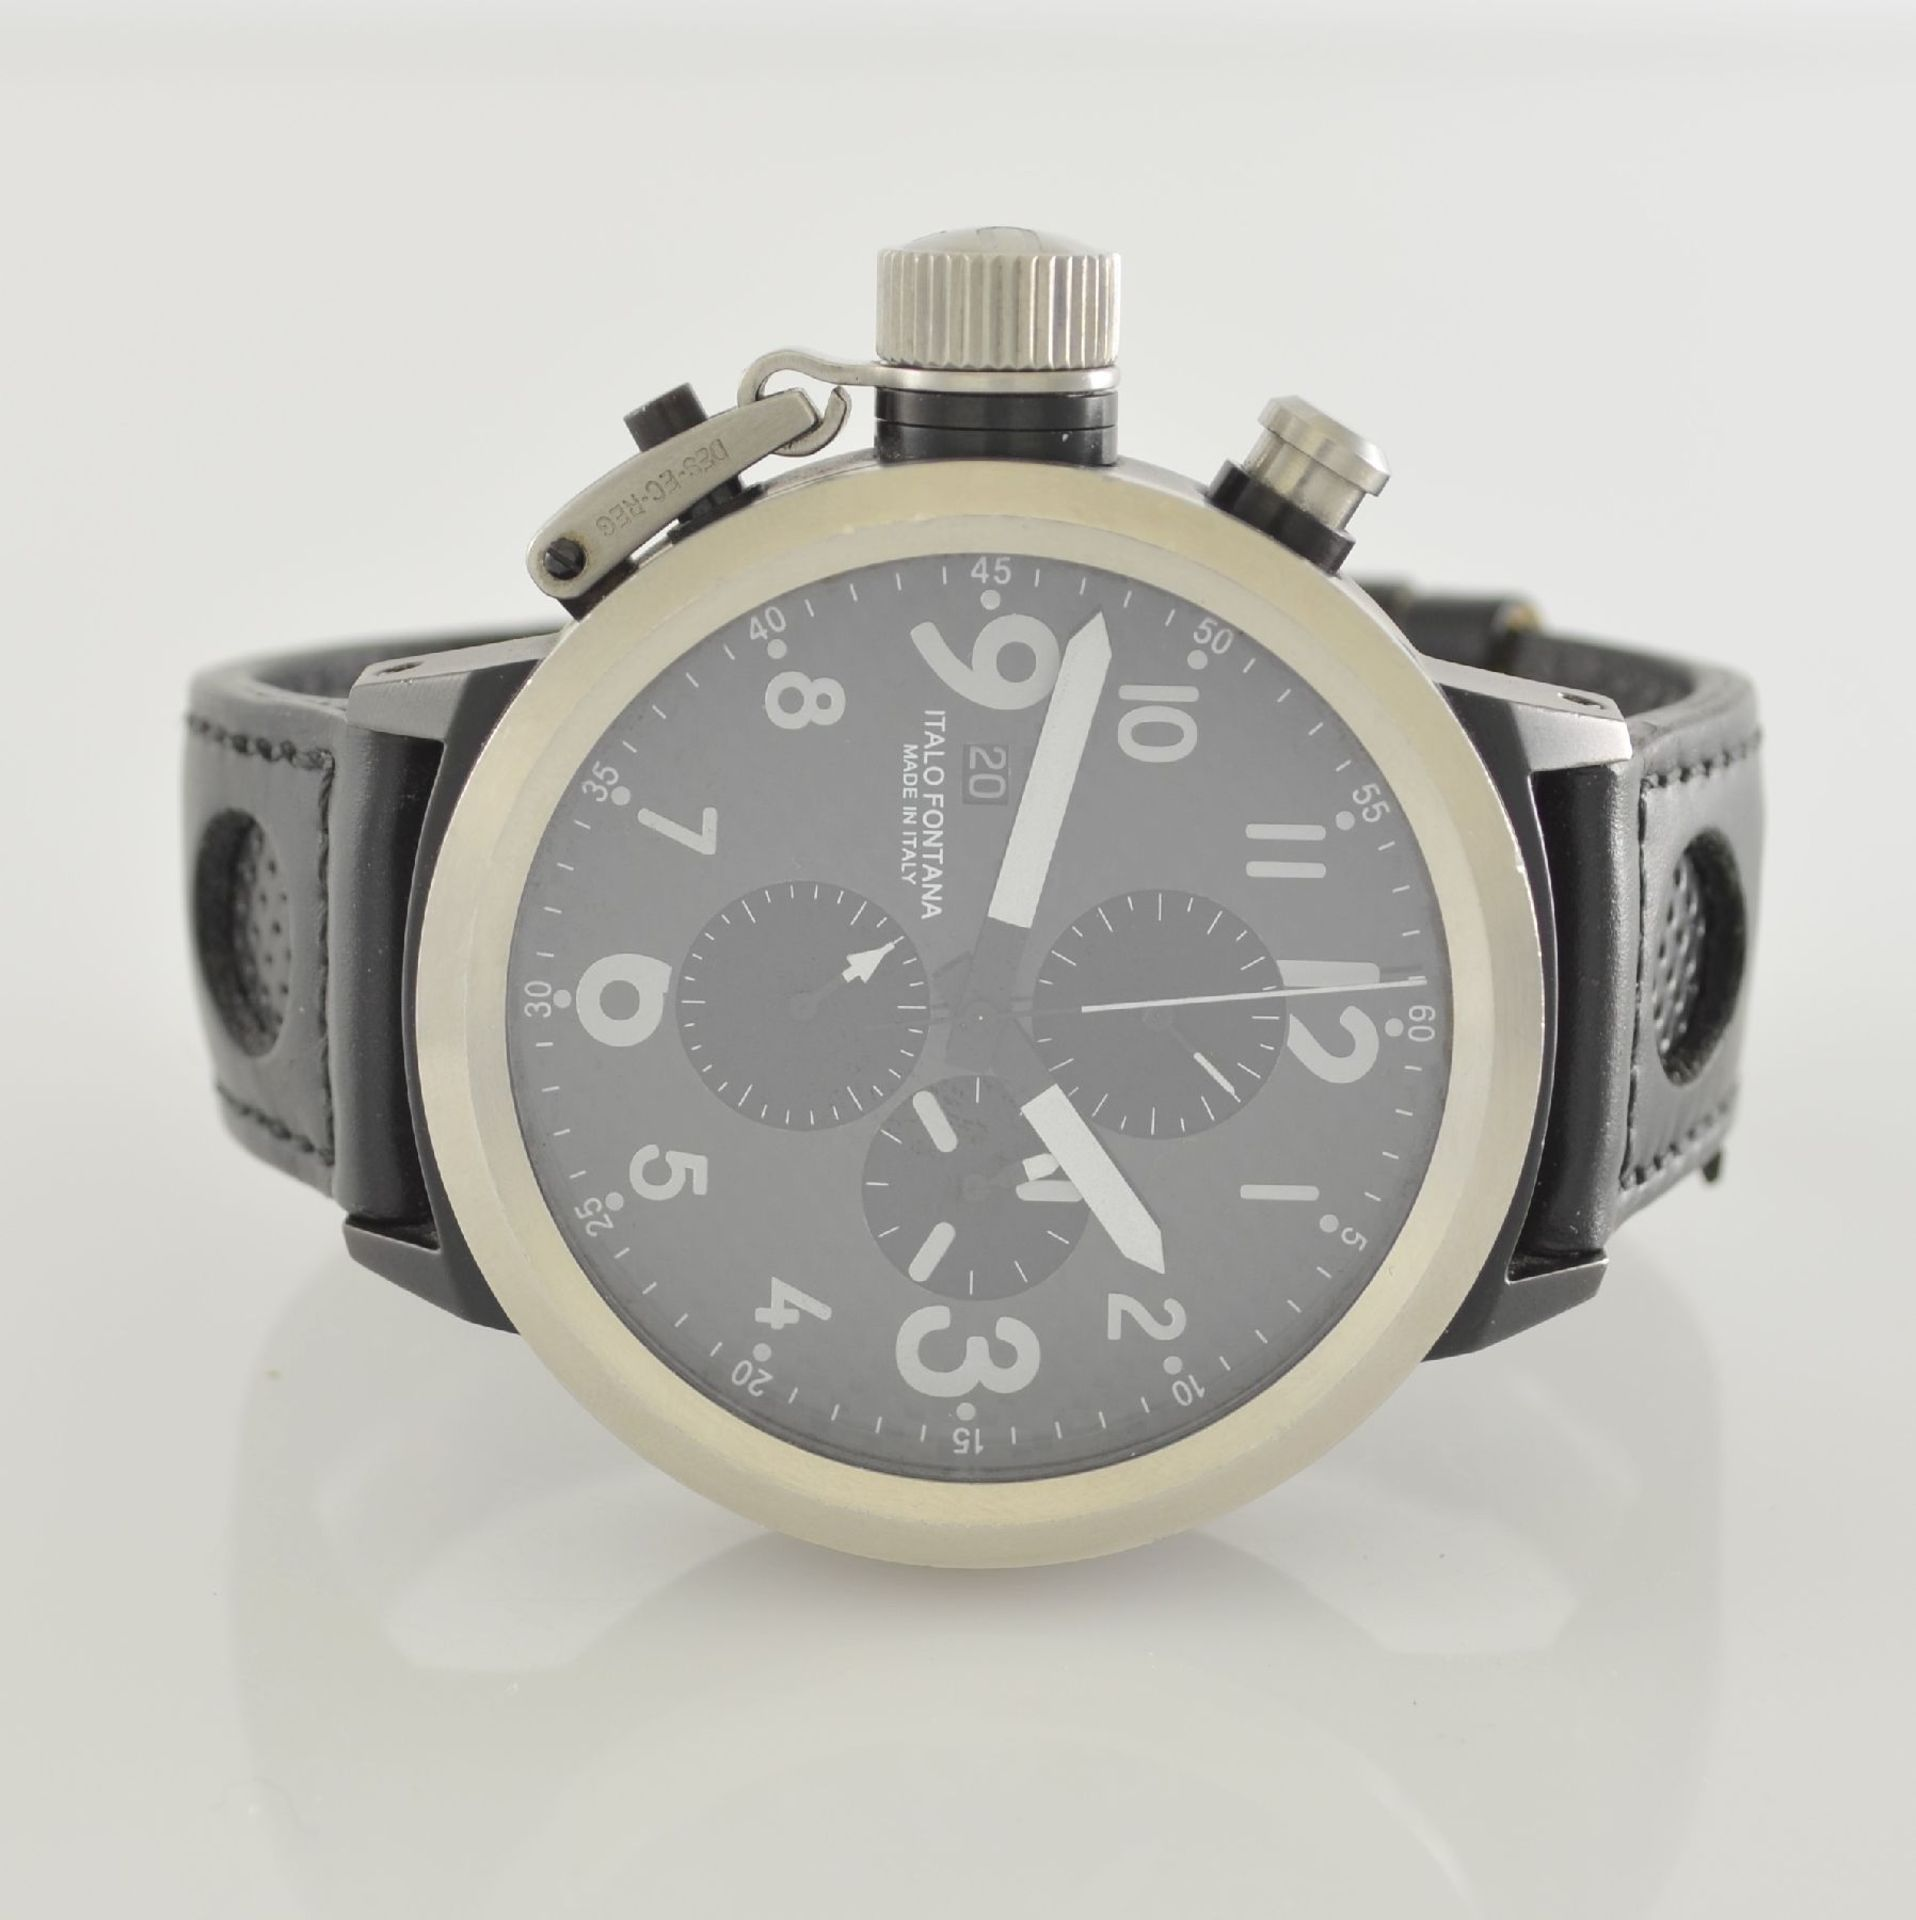 U-BOAT Italo Fontana Herrenarmbanduhr mit Chronograph Model Flightdeck, Automatik, Italien um